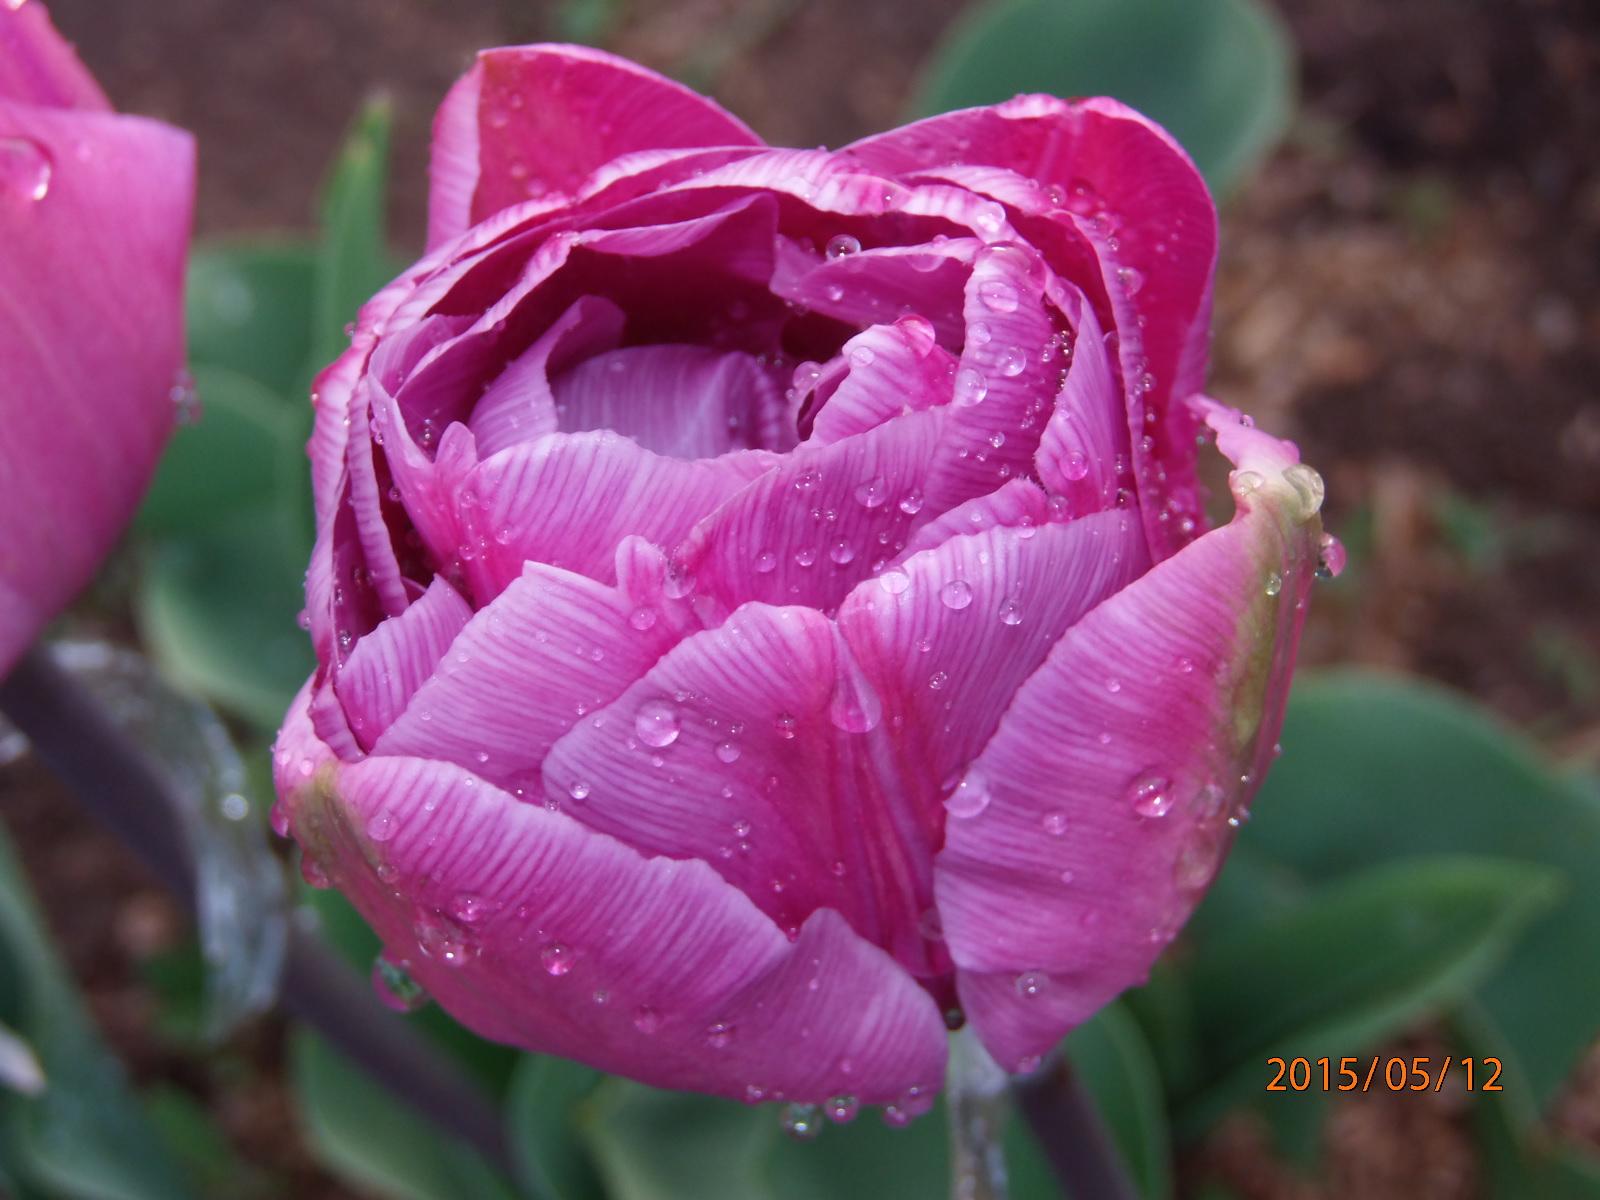 tulpen sorten arten tulpenzwiebeln tulpenpflege tulpen pflanzen und tipps tulpen mehrj hrig. Black Bedroom Furniture Sets. Home Design Ideas